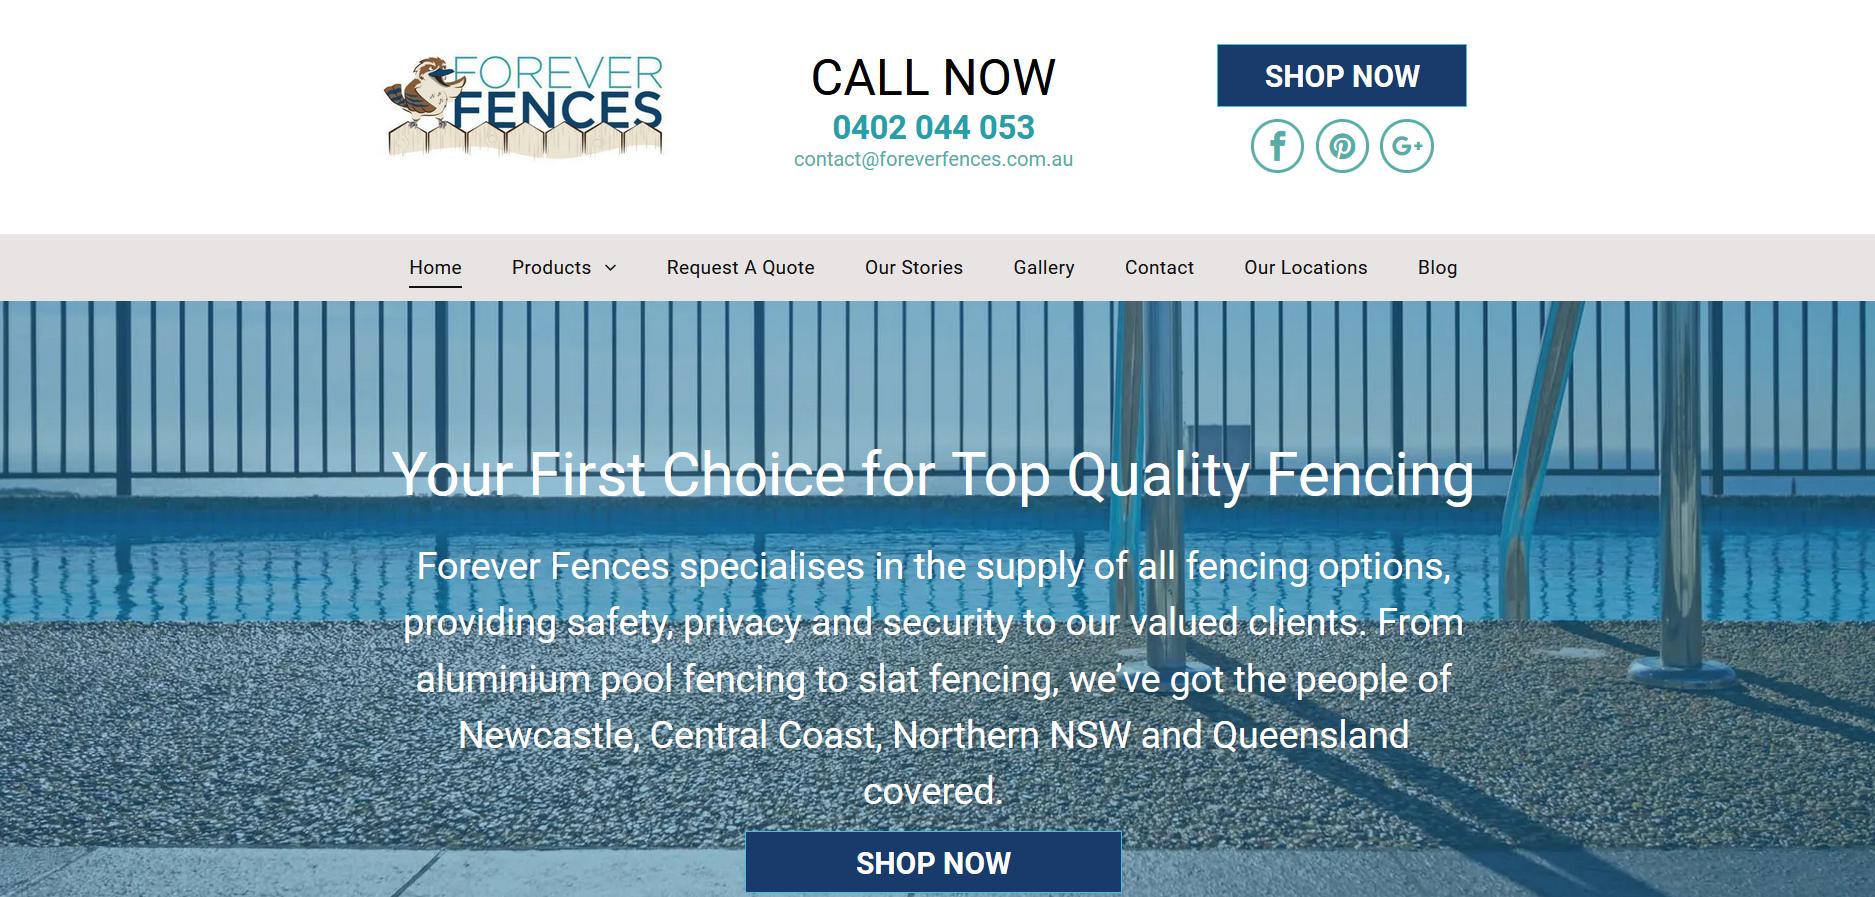 Forever Fences